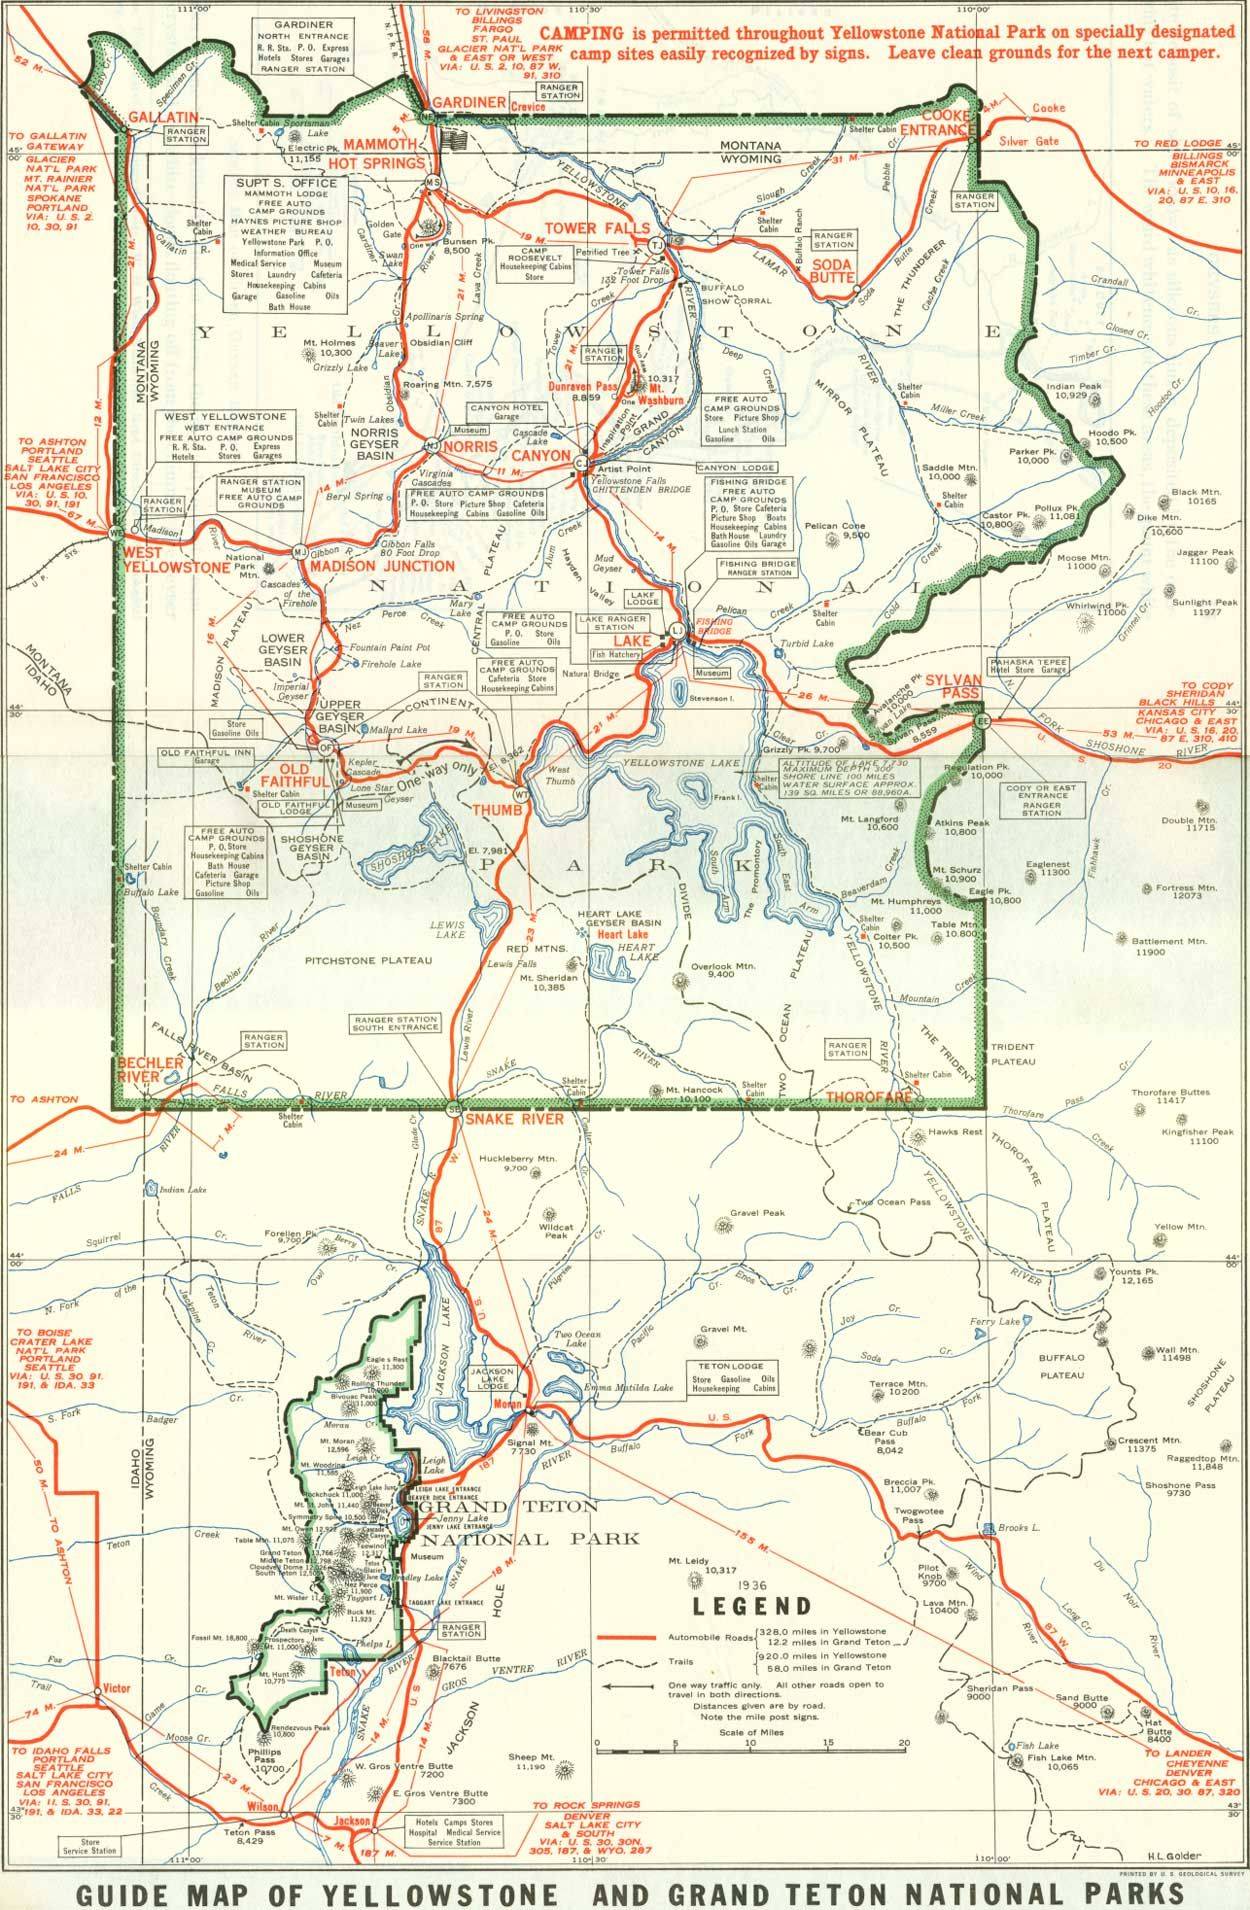 Yellowstone National Park Karte.1929 Yellowstone And Grand Teton National Parks Map